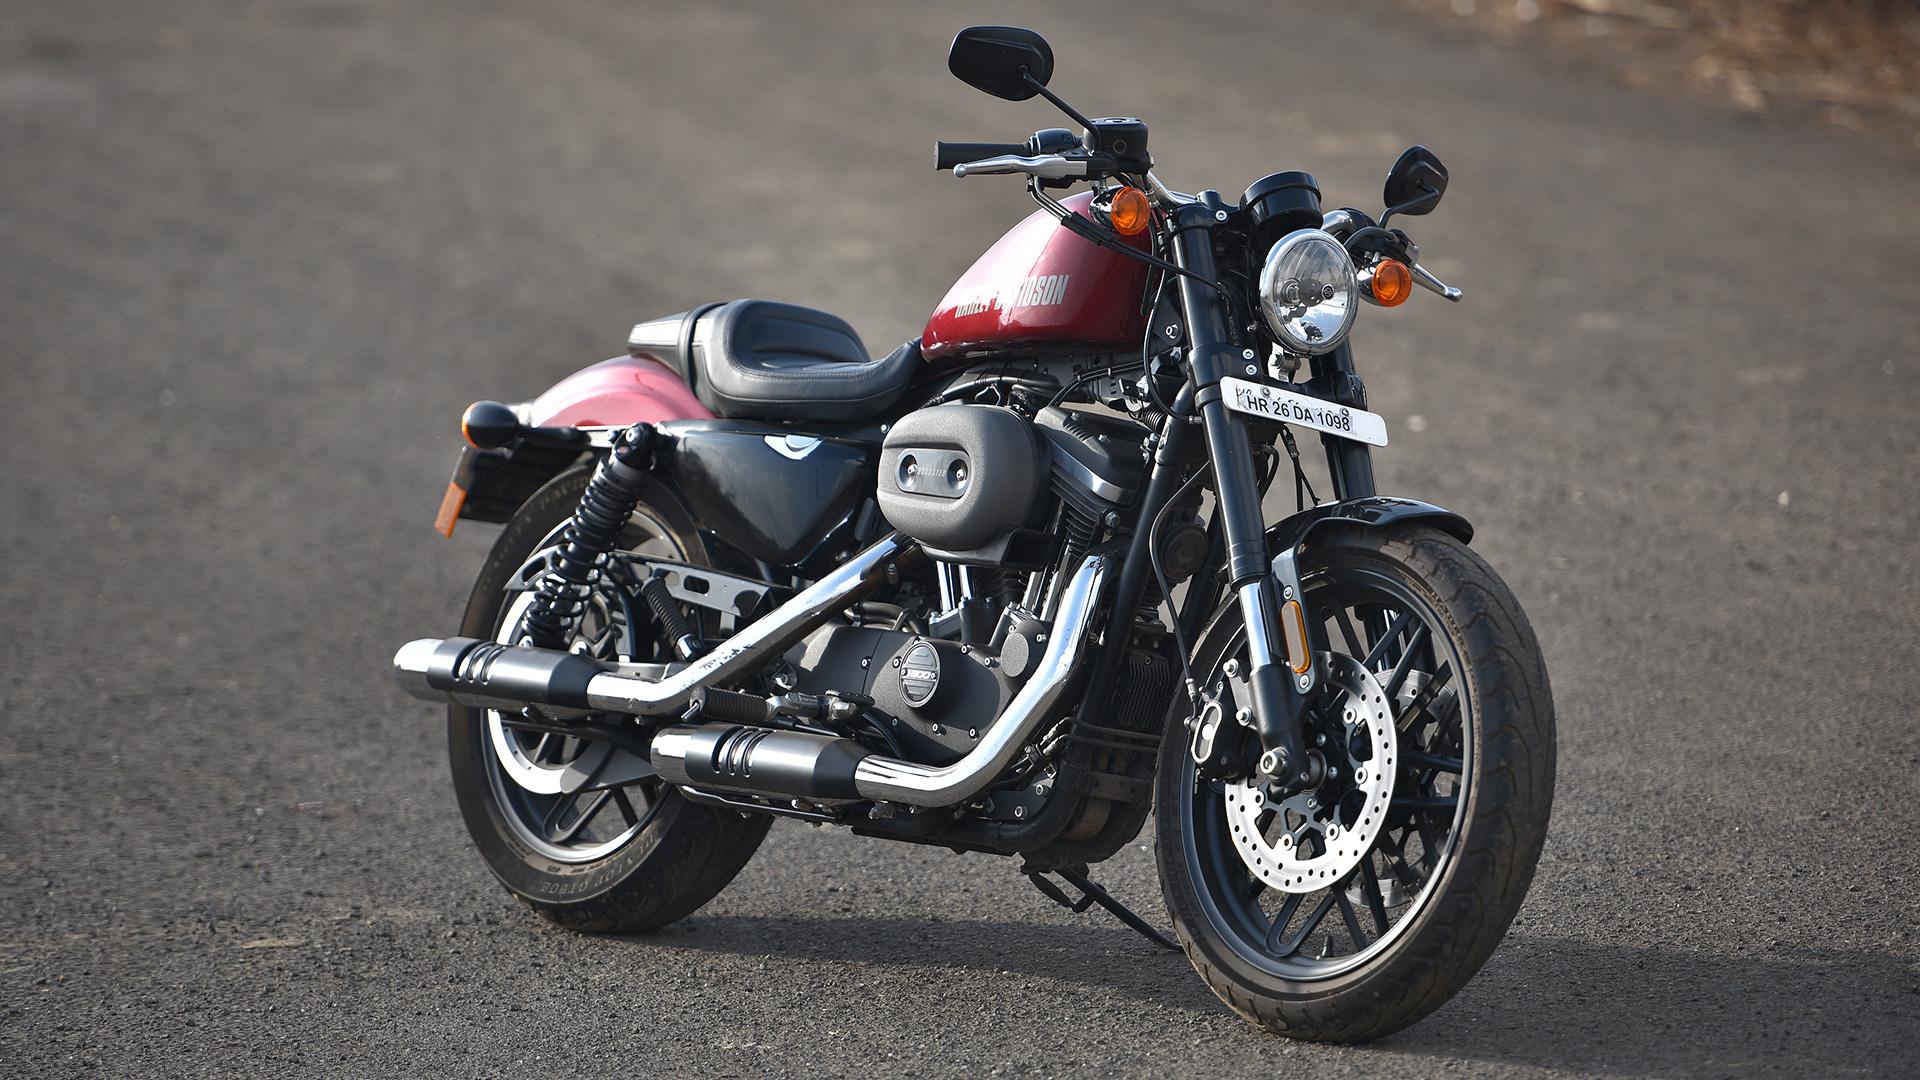 Harley-Davidson Roadster 2016 Std Compare